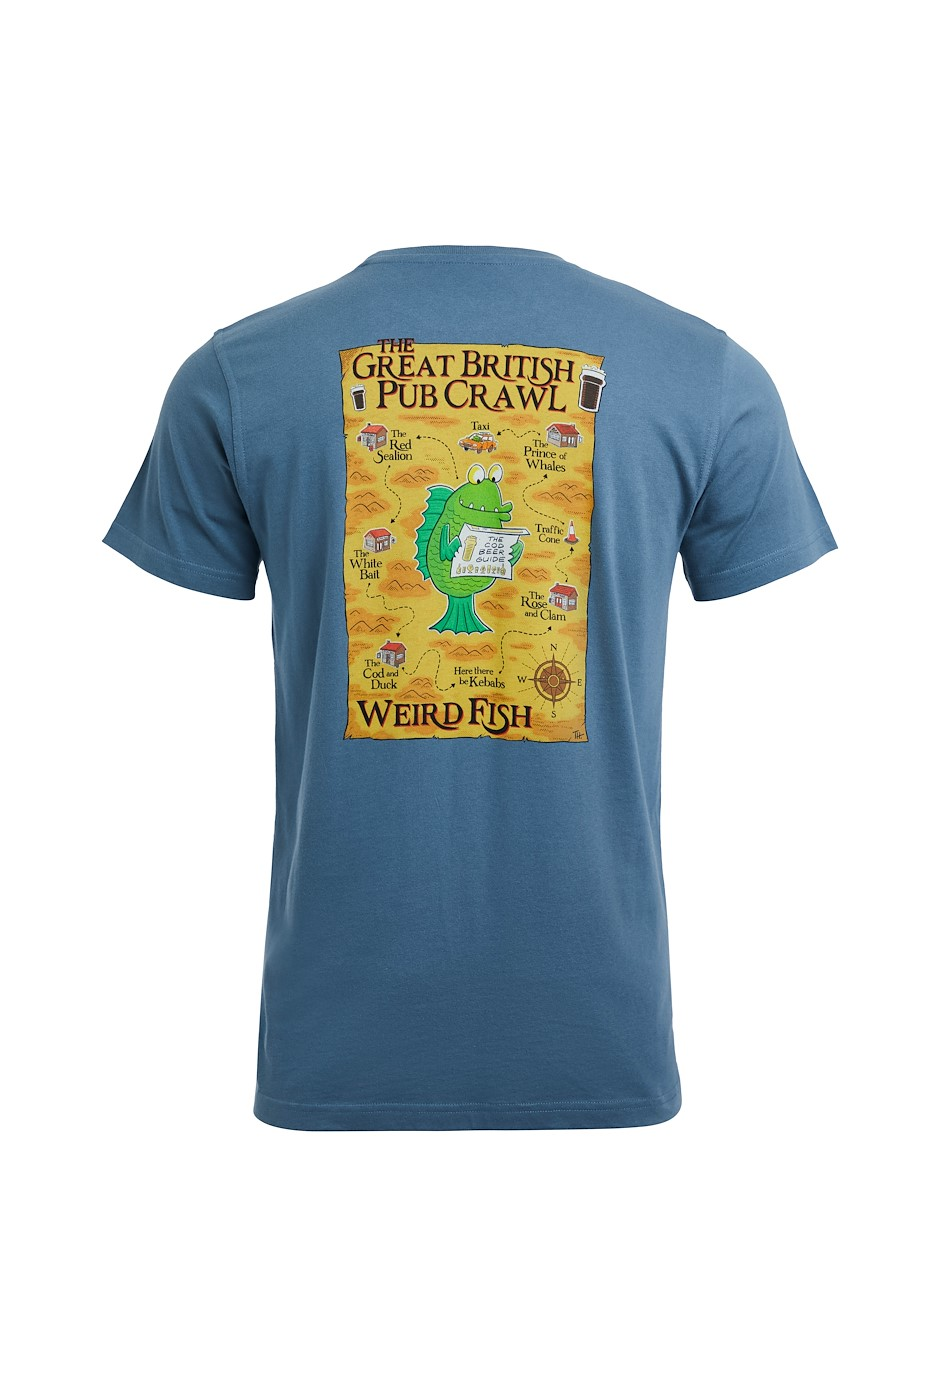 Pub Crawl Organic Cotton Artist T-Shirt Blue Mirage